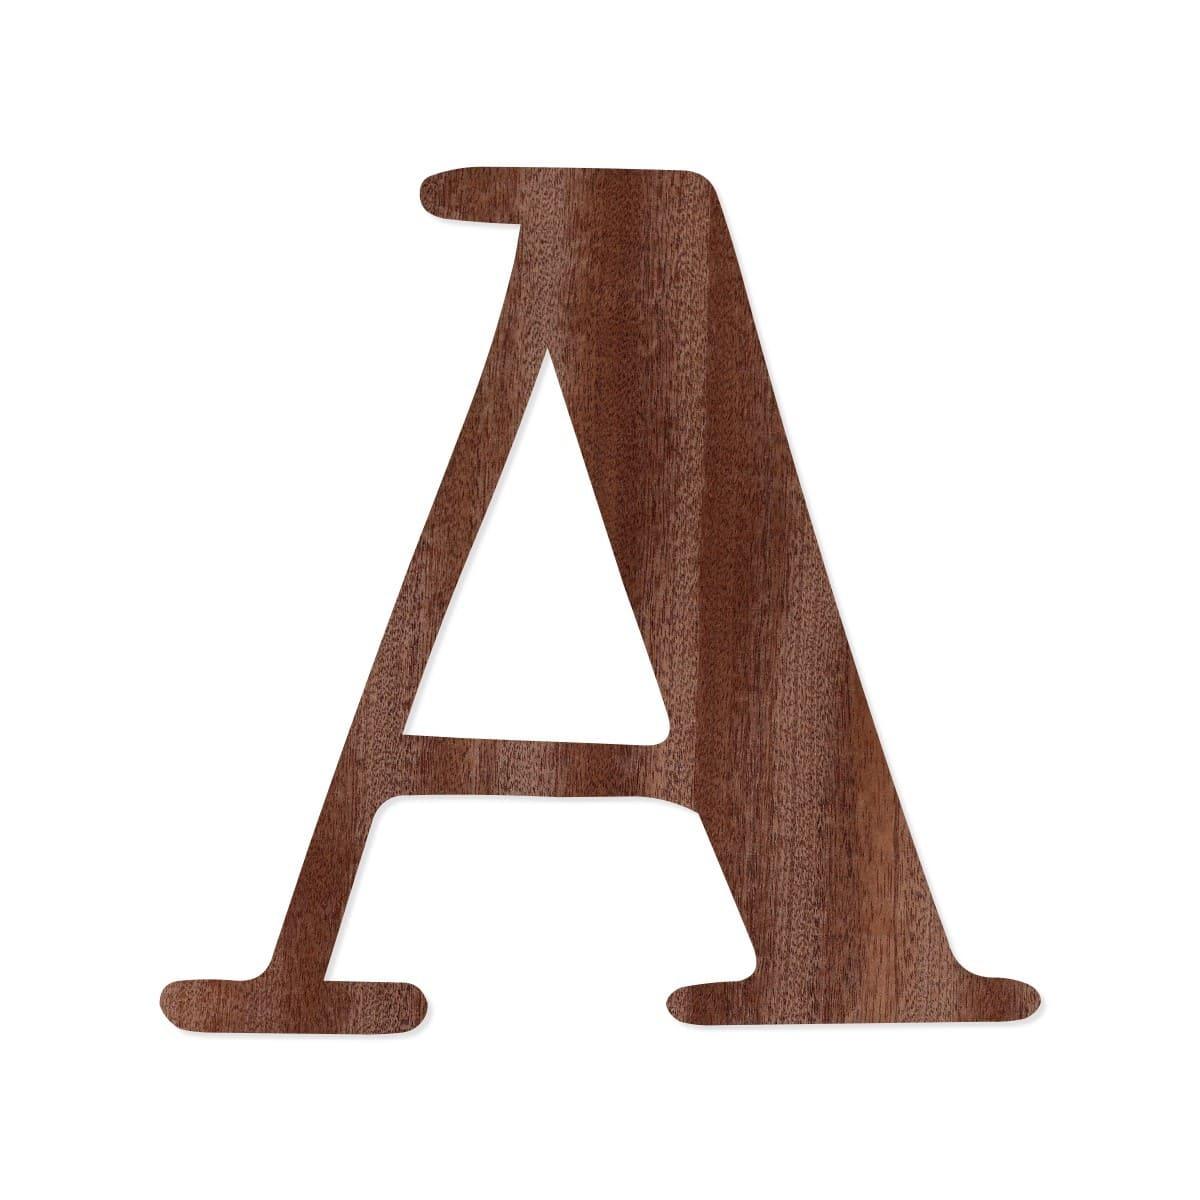 holz furnier buchstaben magnolia schriftzug aus dunklem 0 6mm echtholzfurnier gr enauswahl. Black Bedroom Furniture Sets. Home Design Ideas